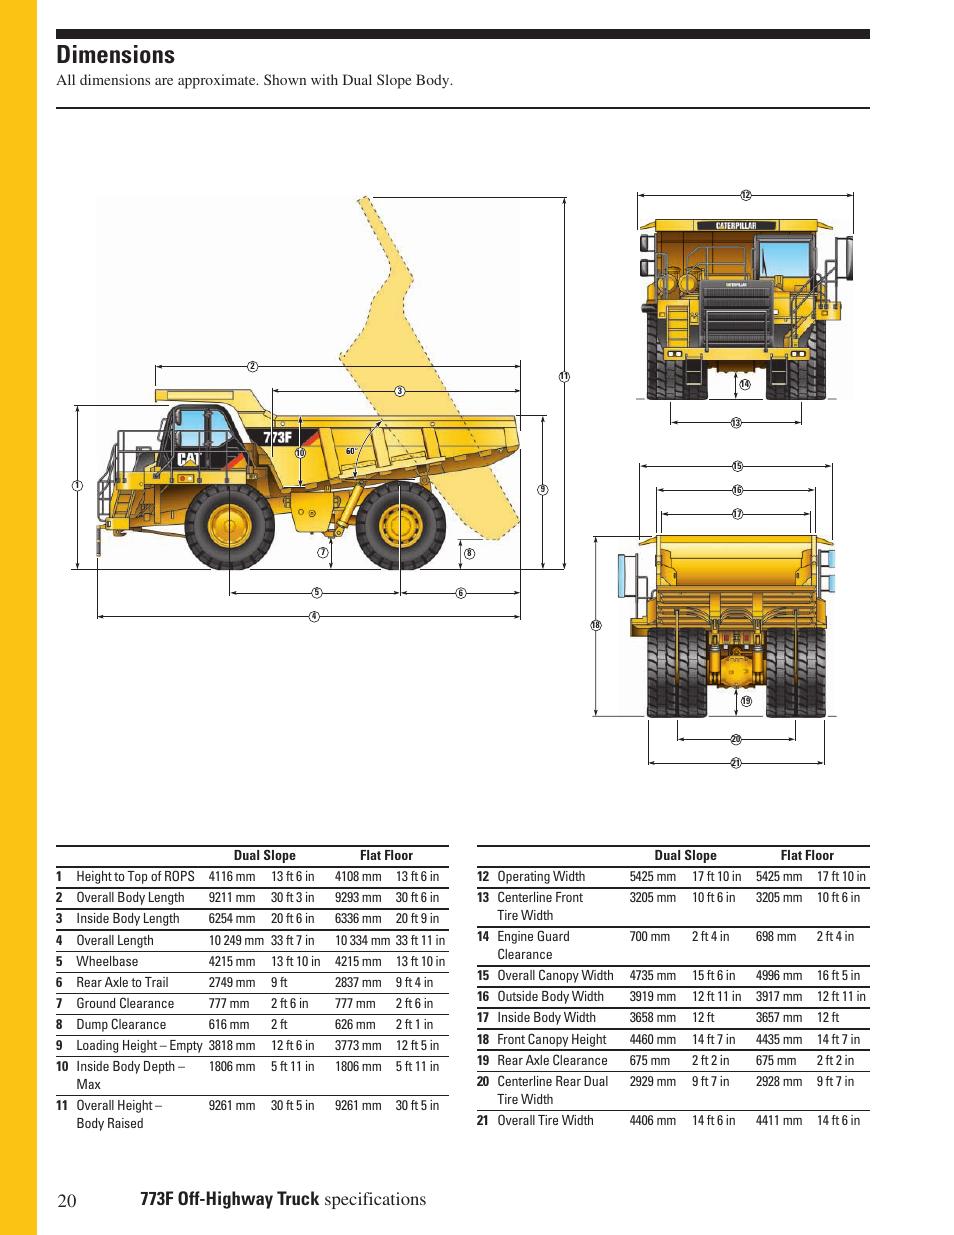 Dimensions Milton Cat 773f User Manual Page 20 28 13 Engine Diagram